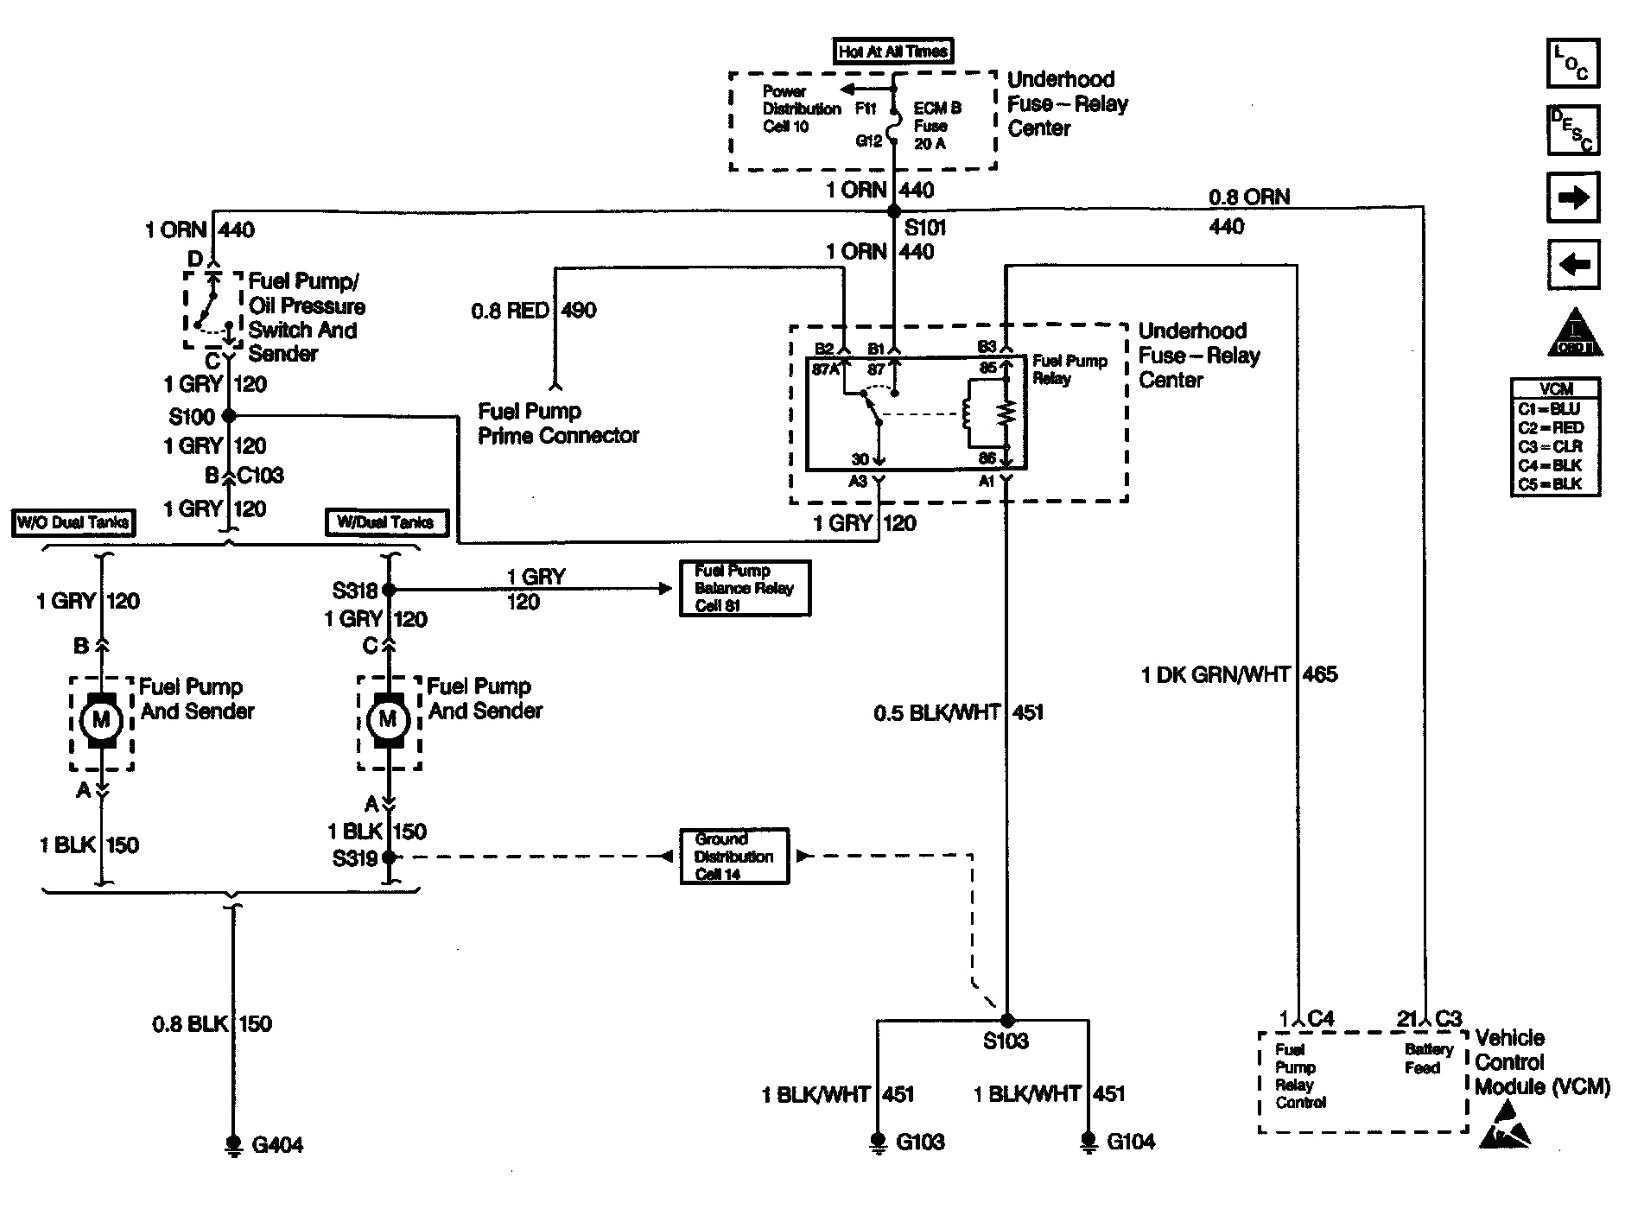 Wiring For 2000 Chevy Silverado 1500 Fuel System Diagram - Wiring - 2000 Chevy Silverado Fuel Pump Wiring Diagram